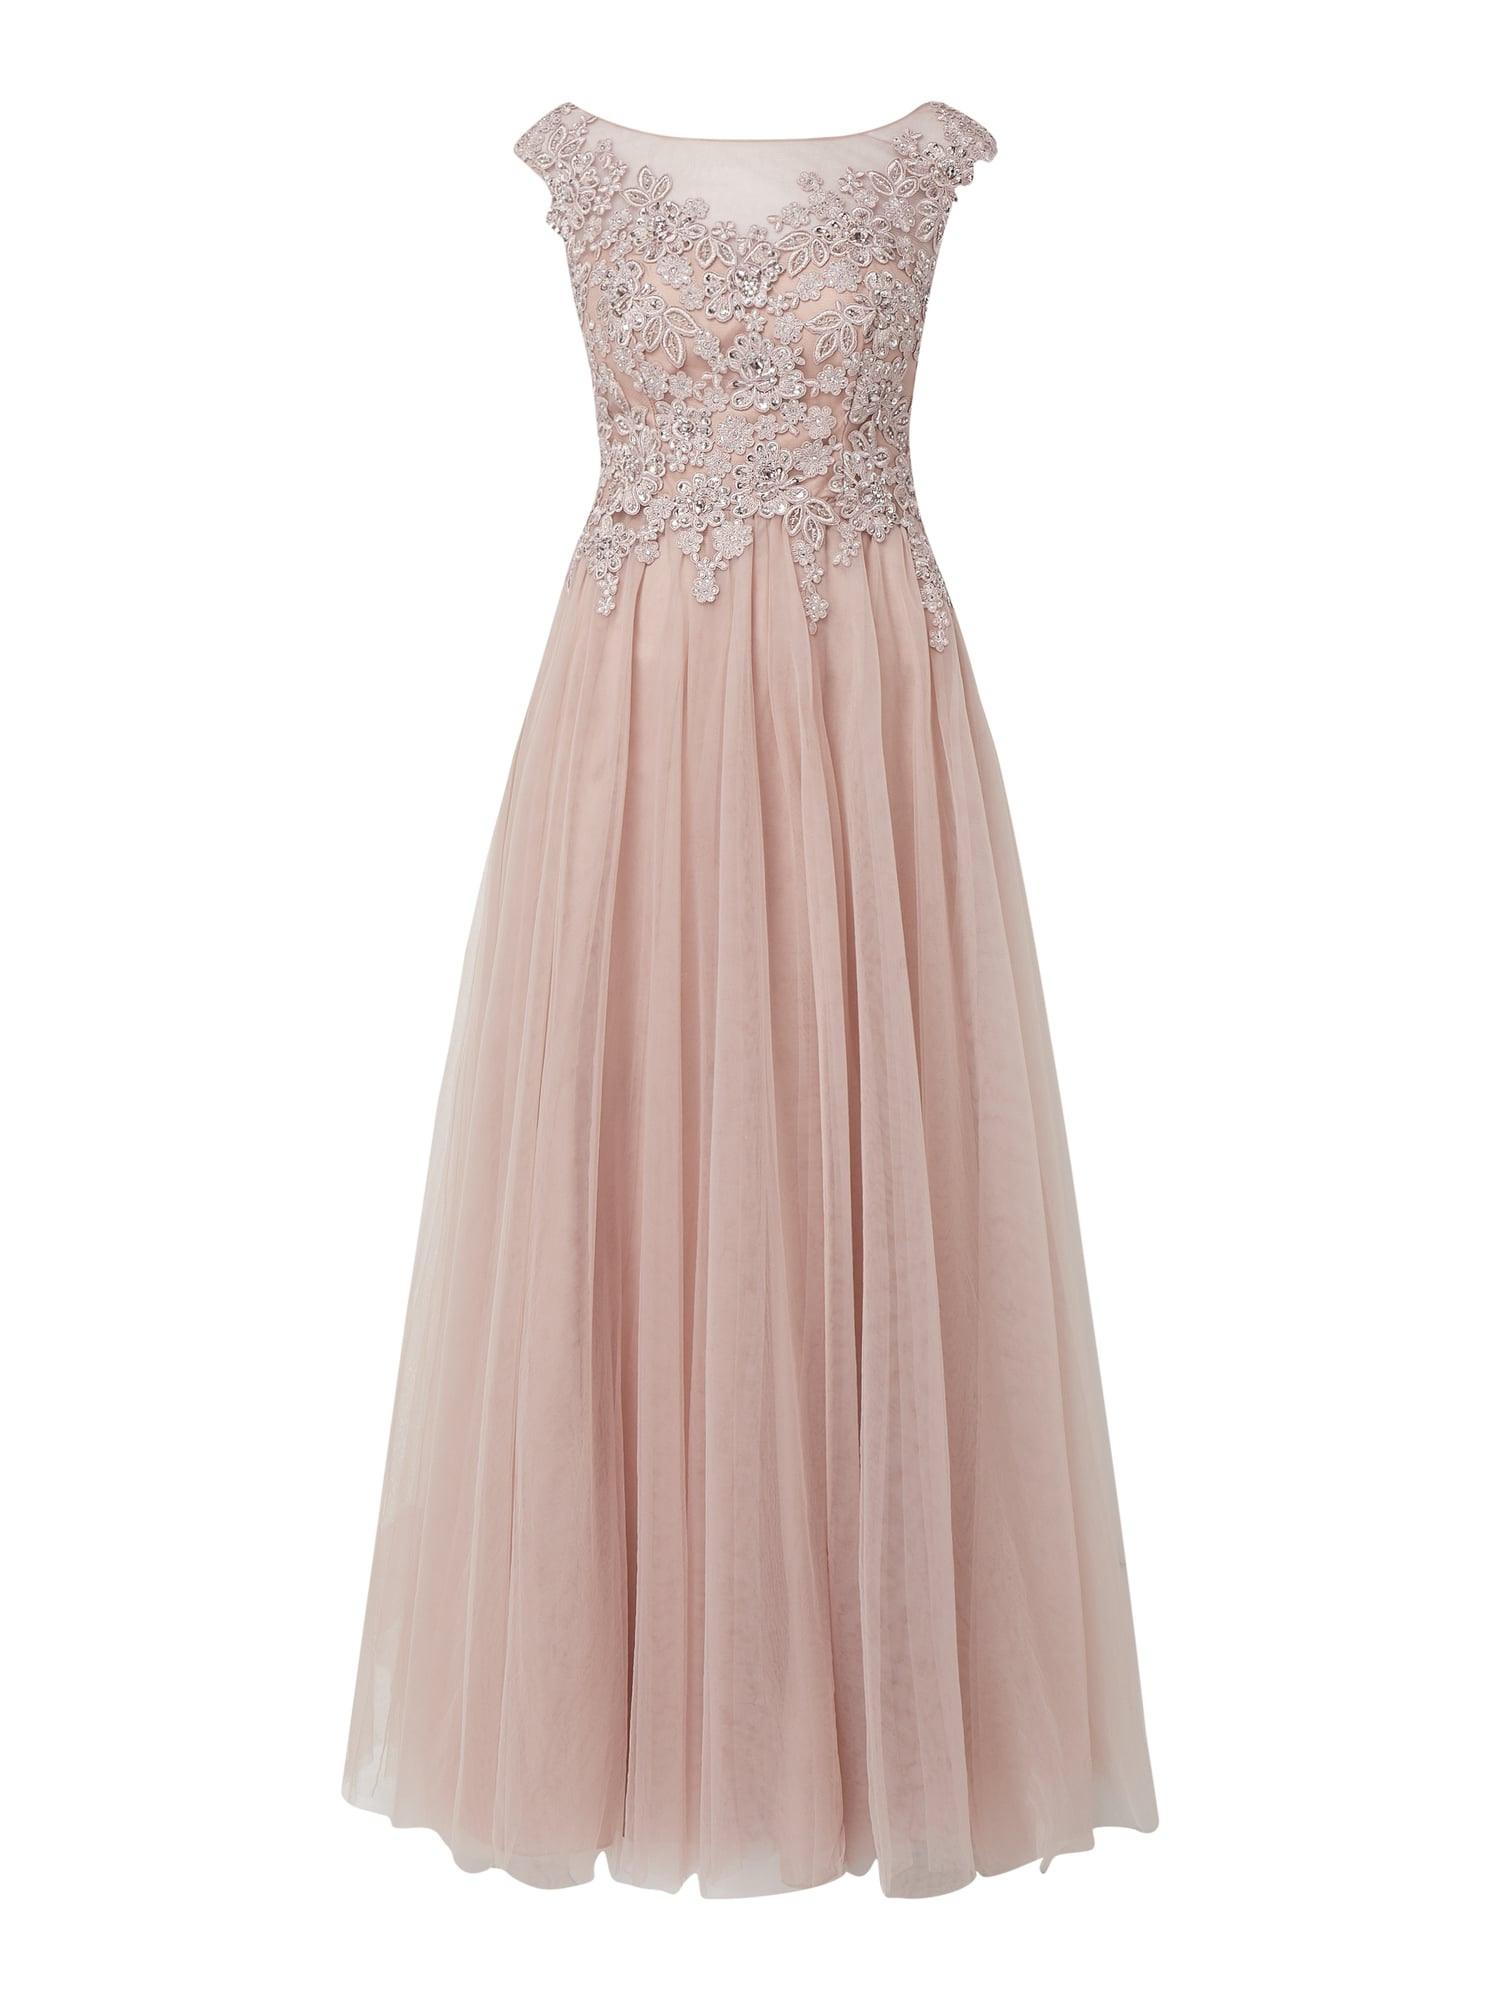 10 Top Luxuar Abendkleid Bester Preis10 Kreativ Luxuar Abendkleid Vertrieb